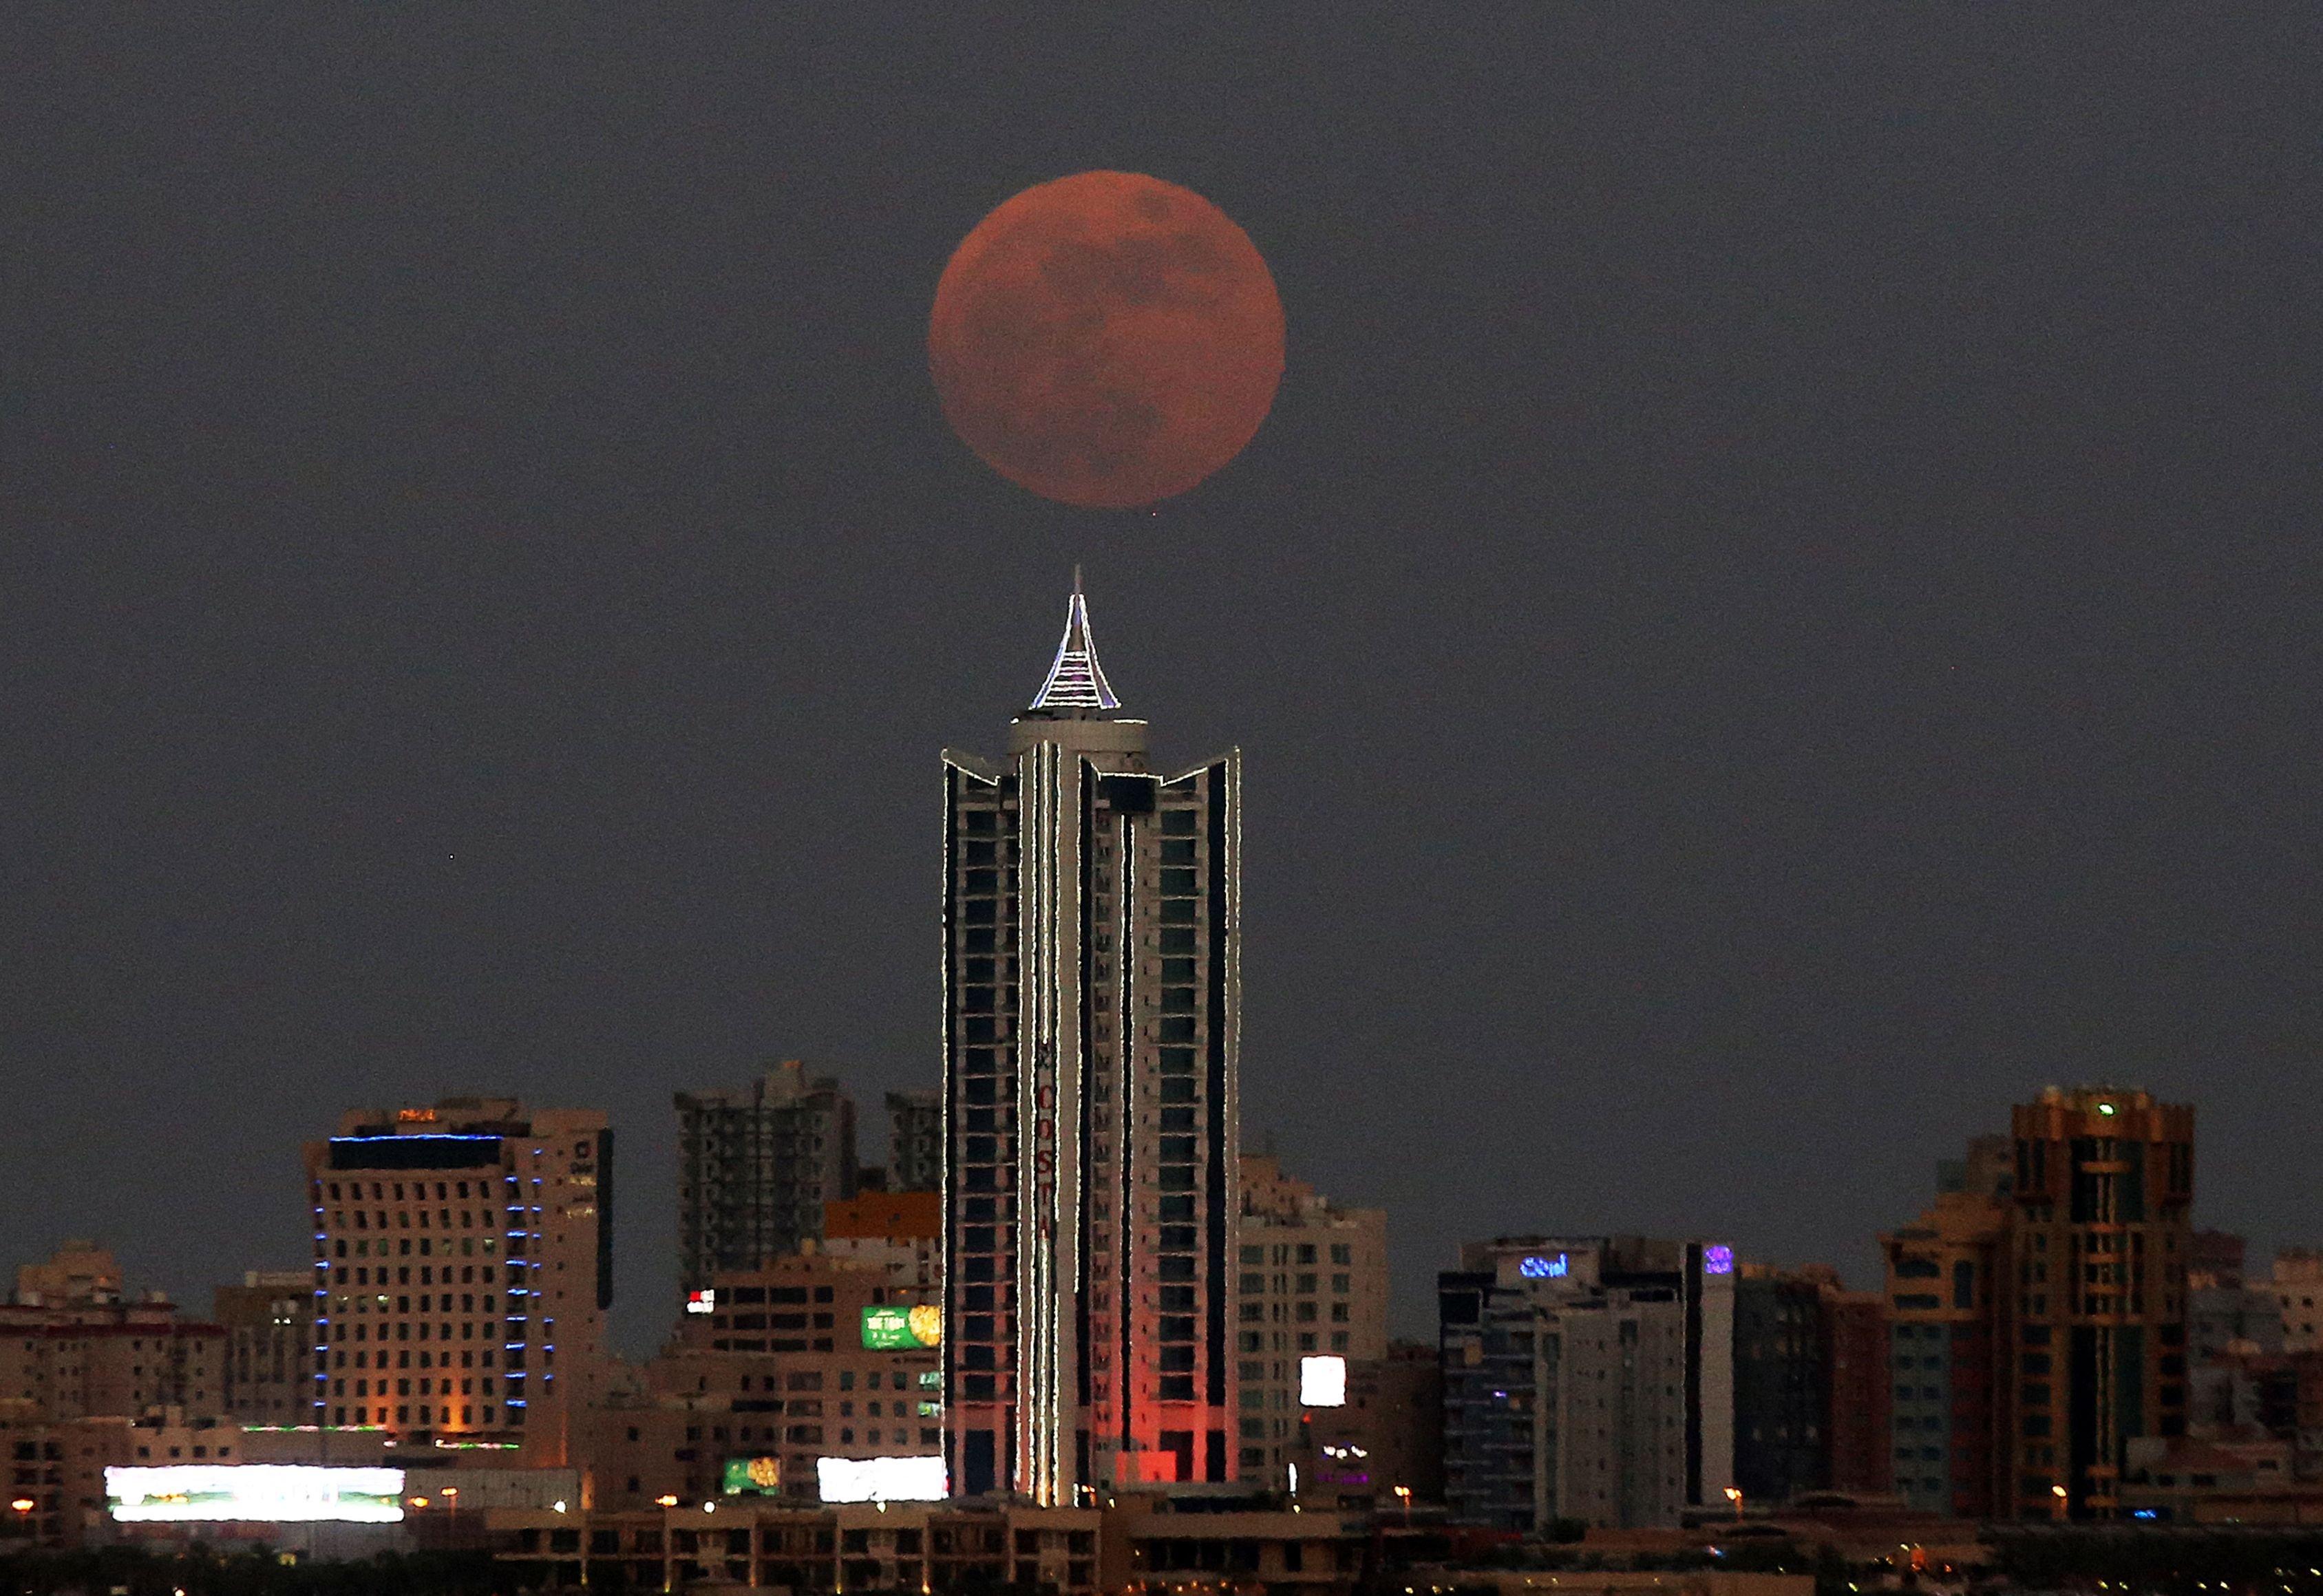 KUWAIT-ASTRONOMY-MOON